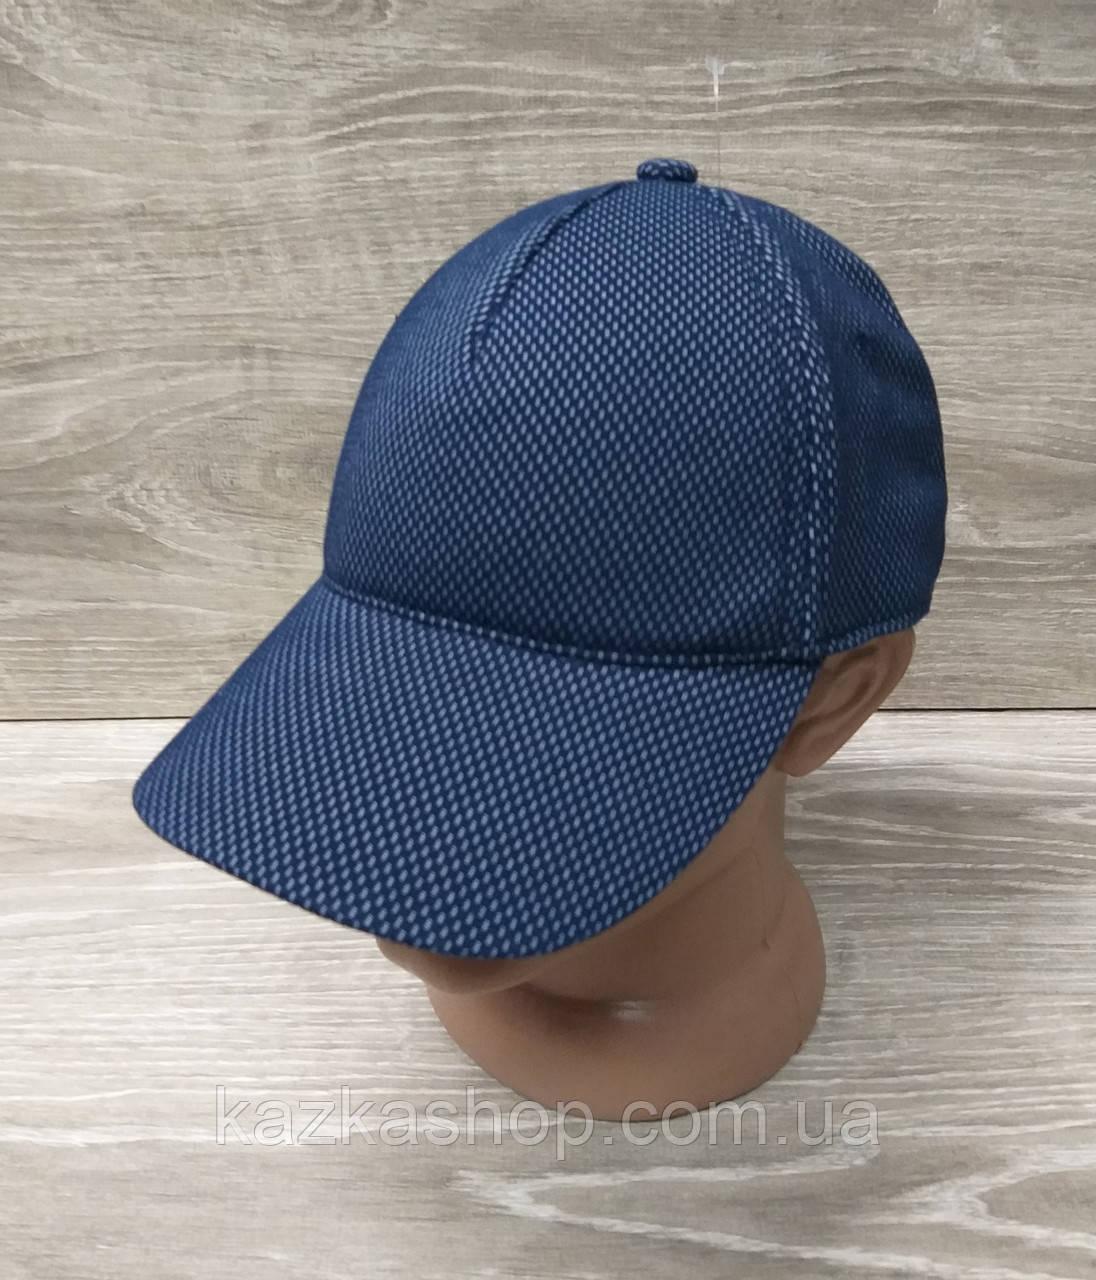 Мужская бейсболка, кепка, материал лакоста, без вышивки и вставок, размер 57-58, на регуляторе